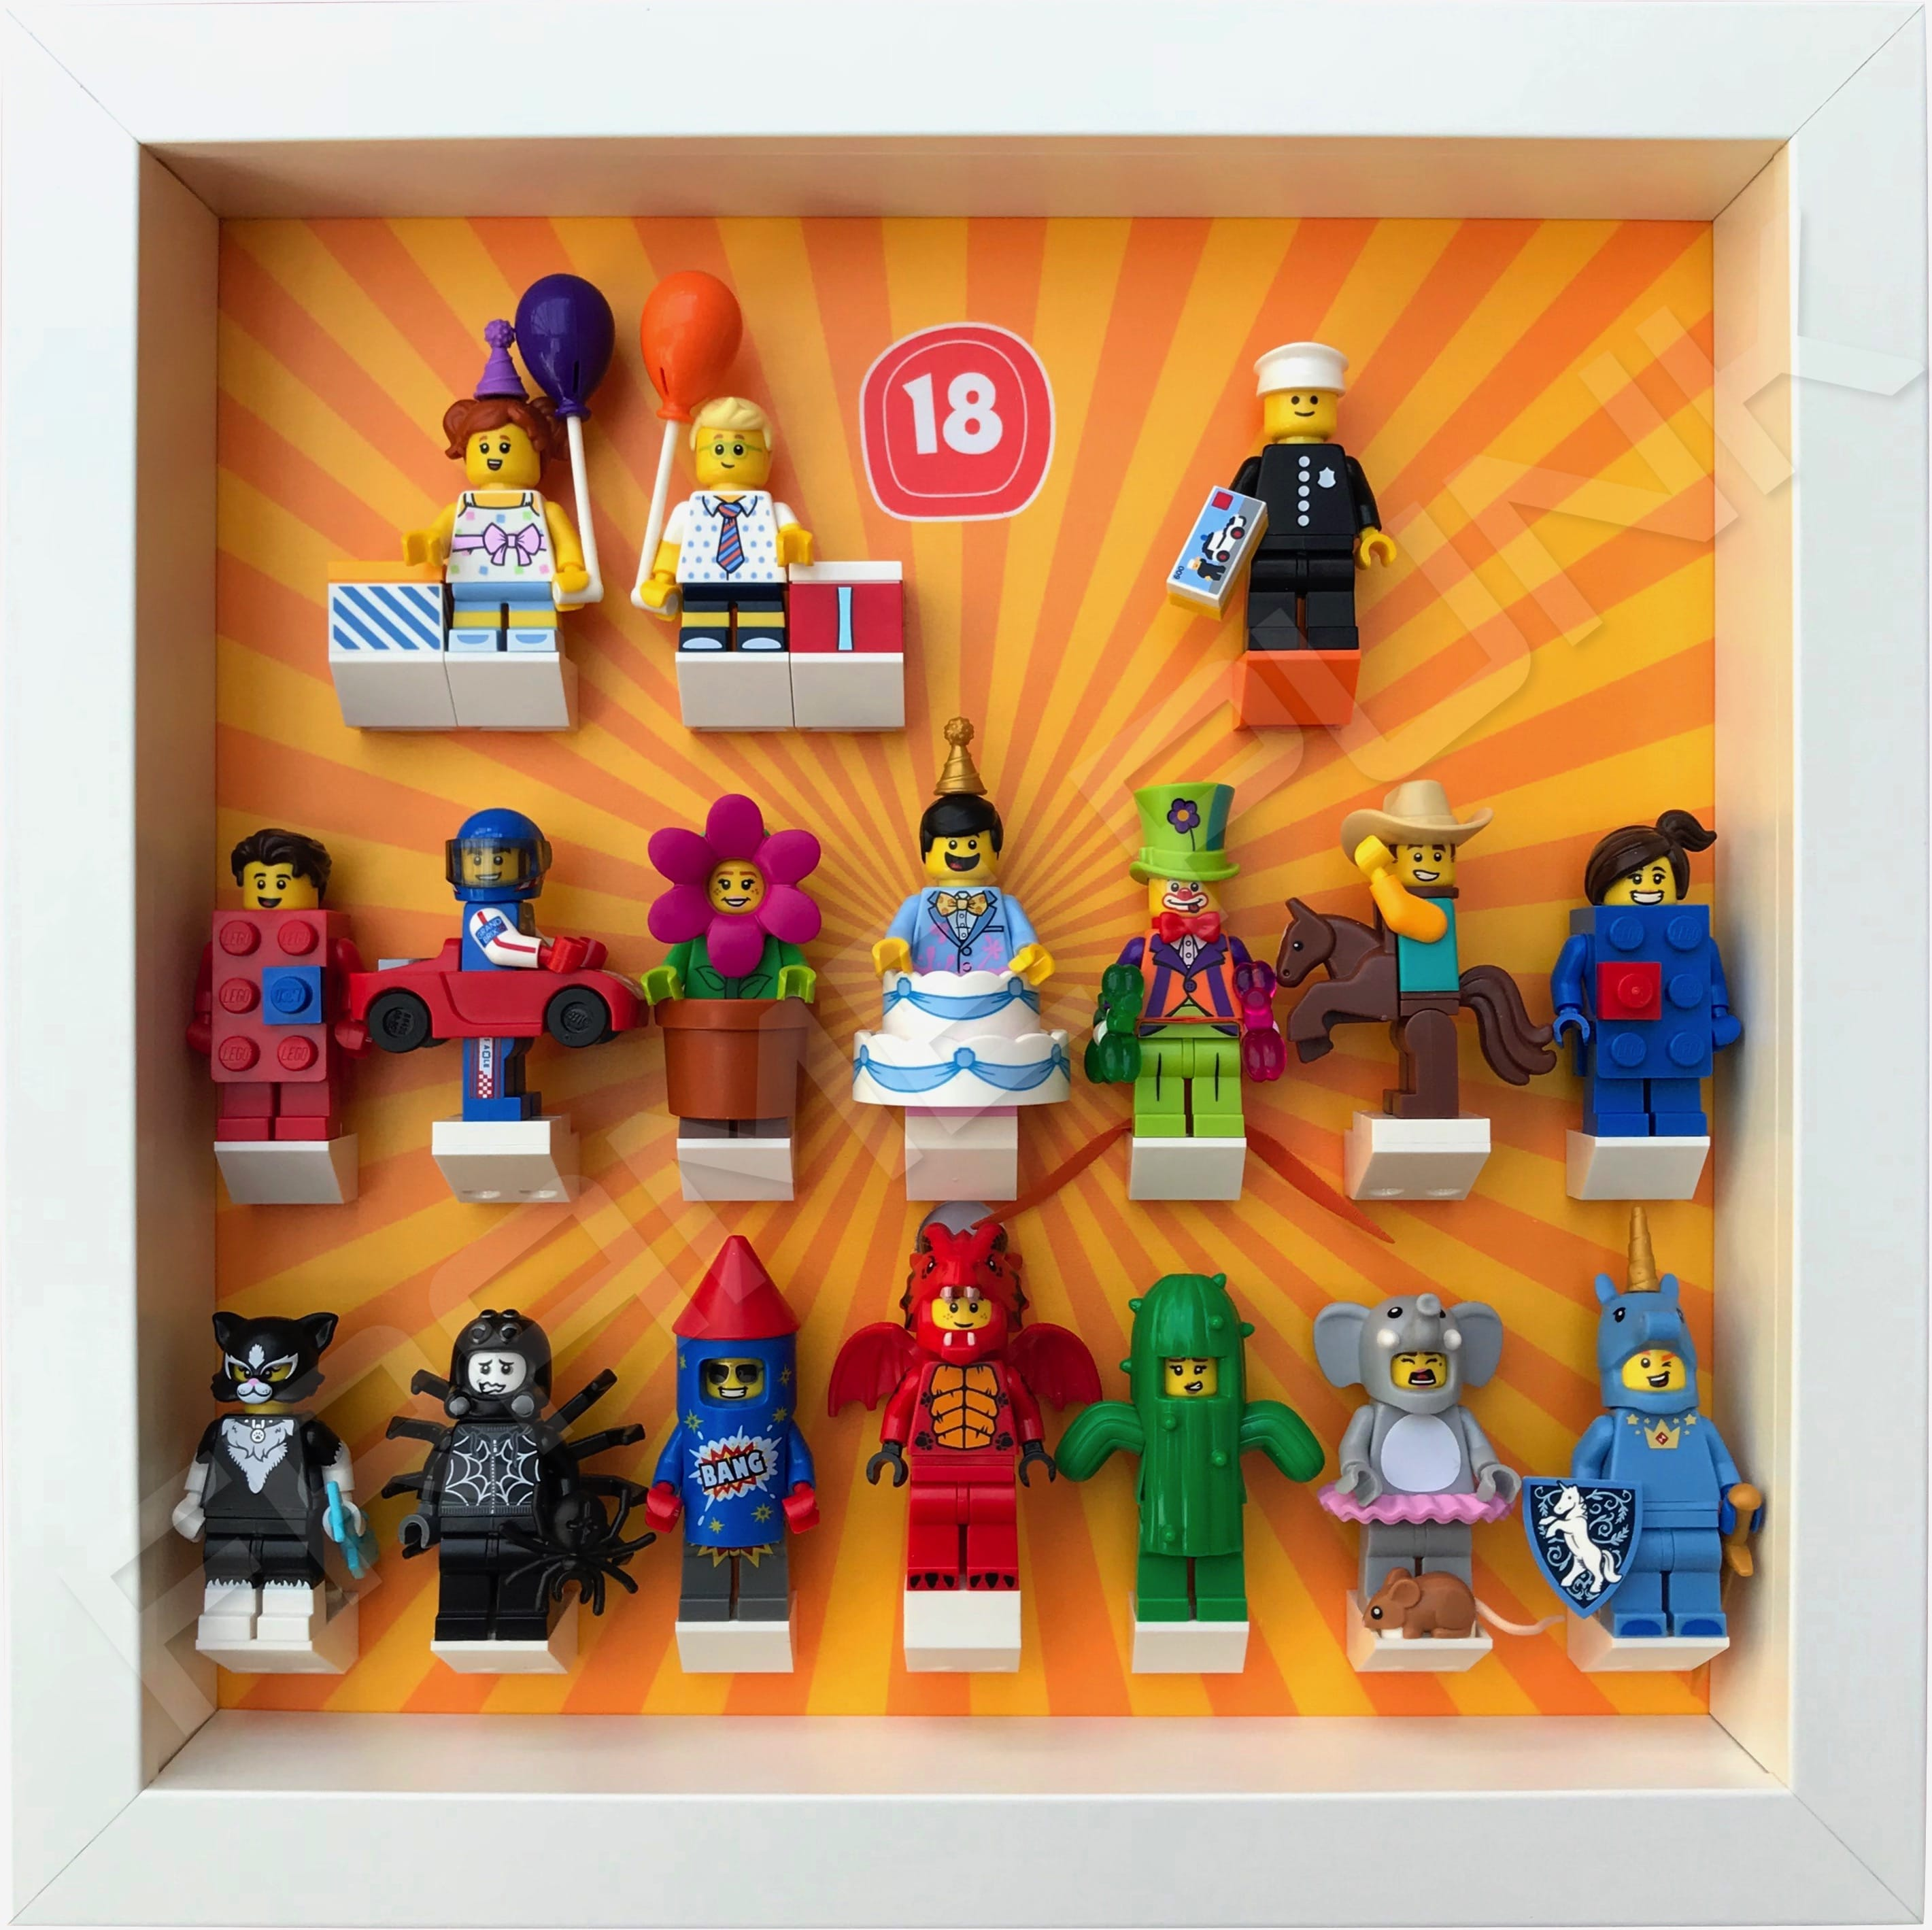 LEGO Minifigures Series 18 Display Frame | Frame Punk